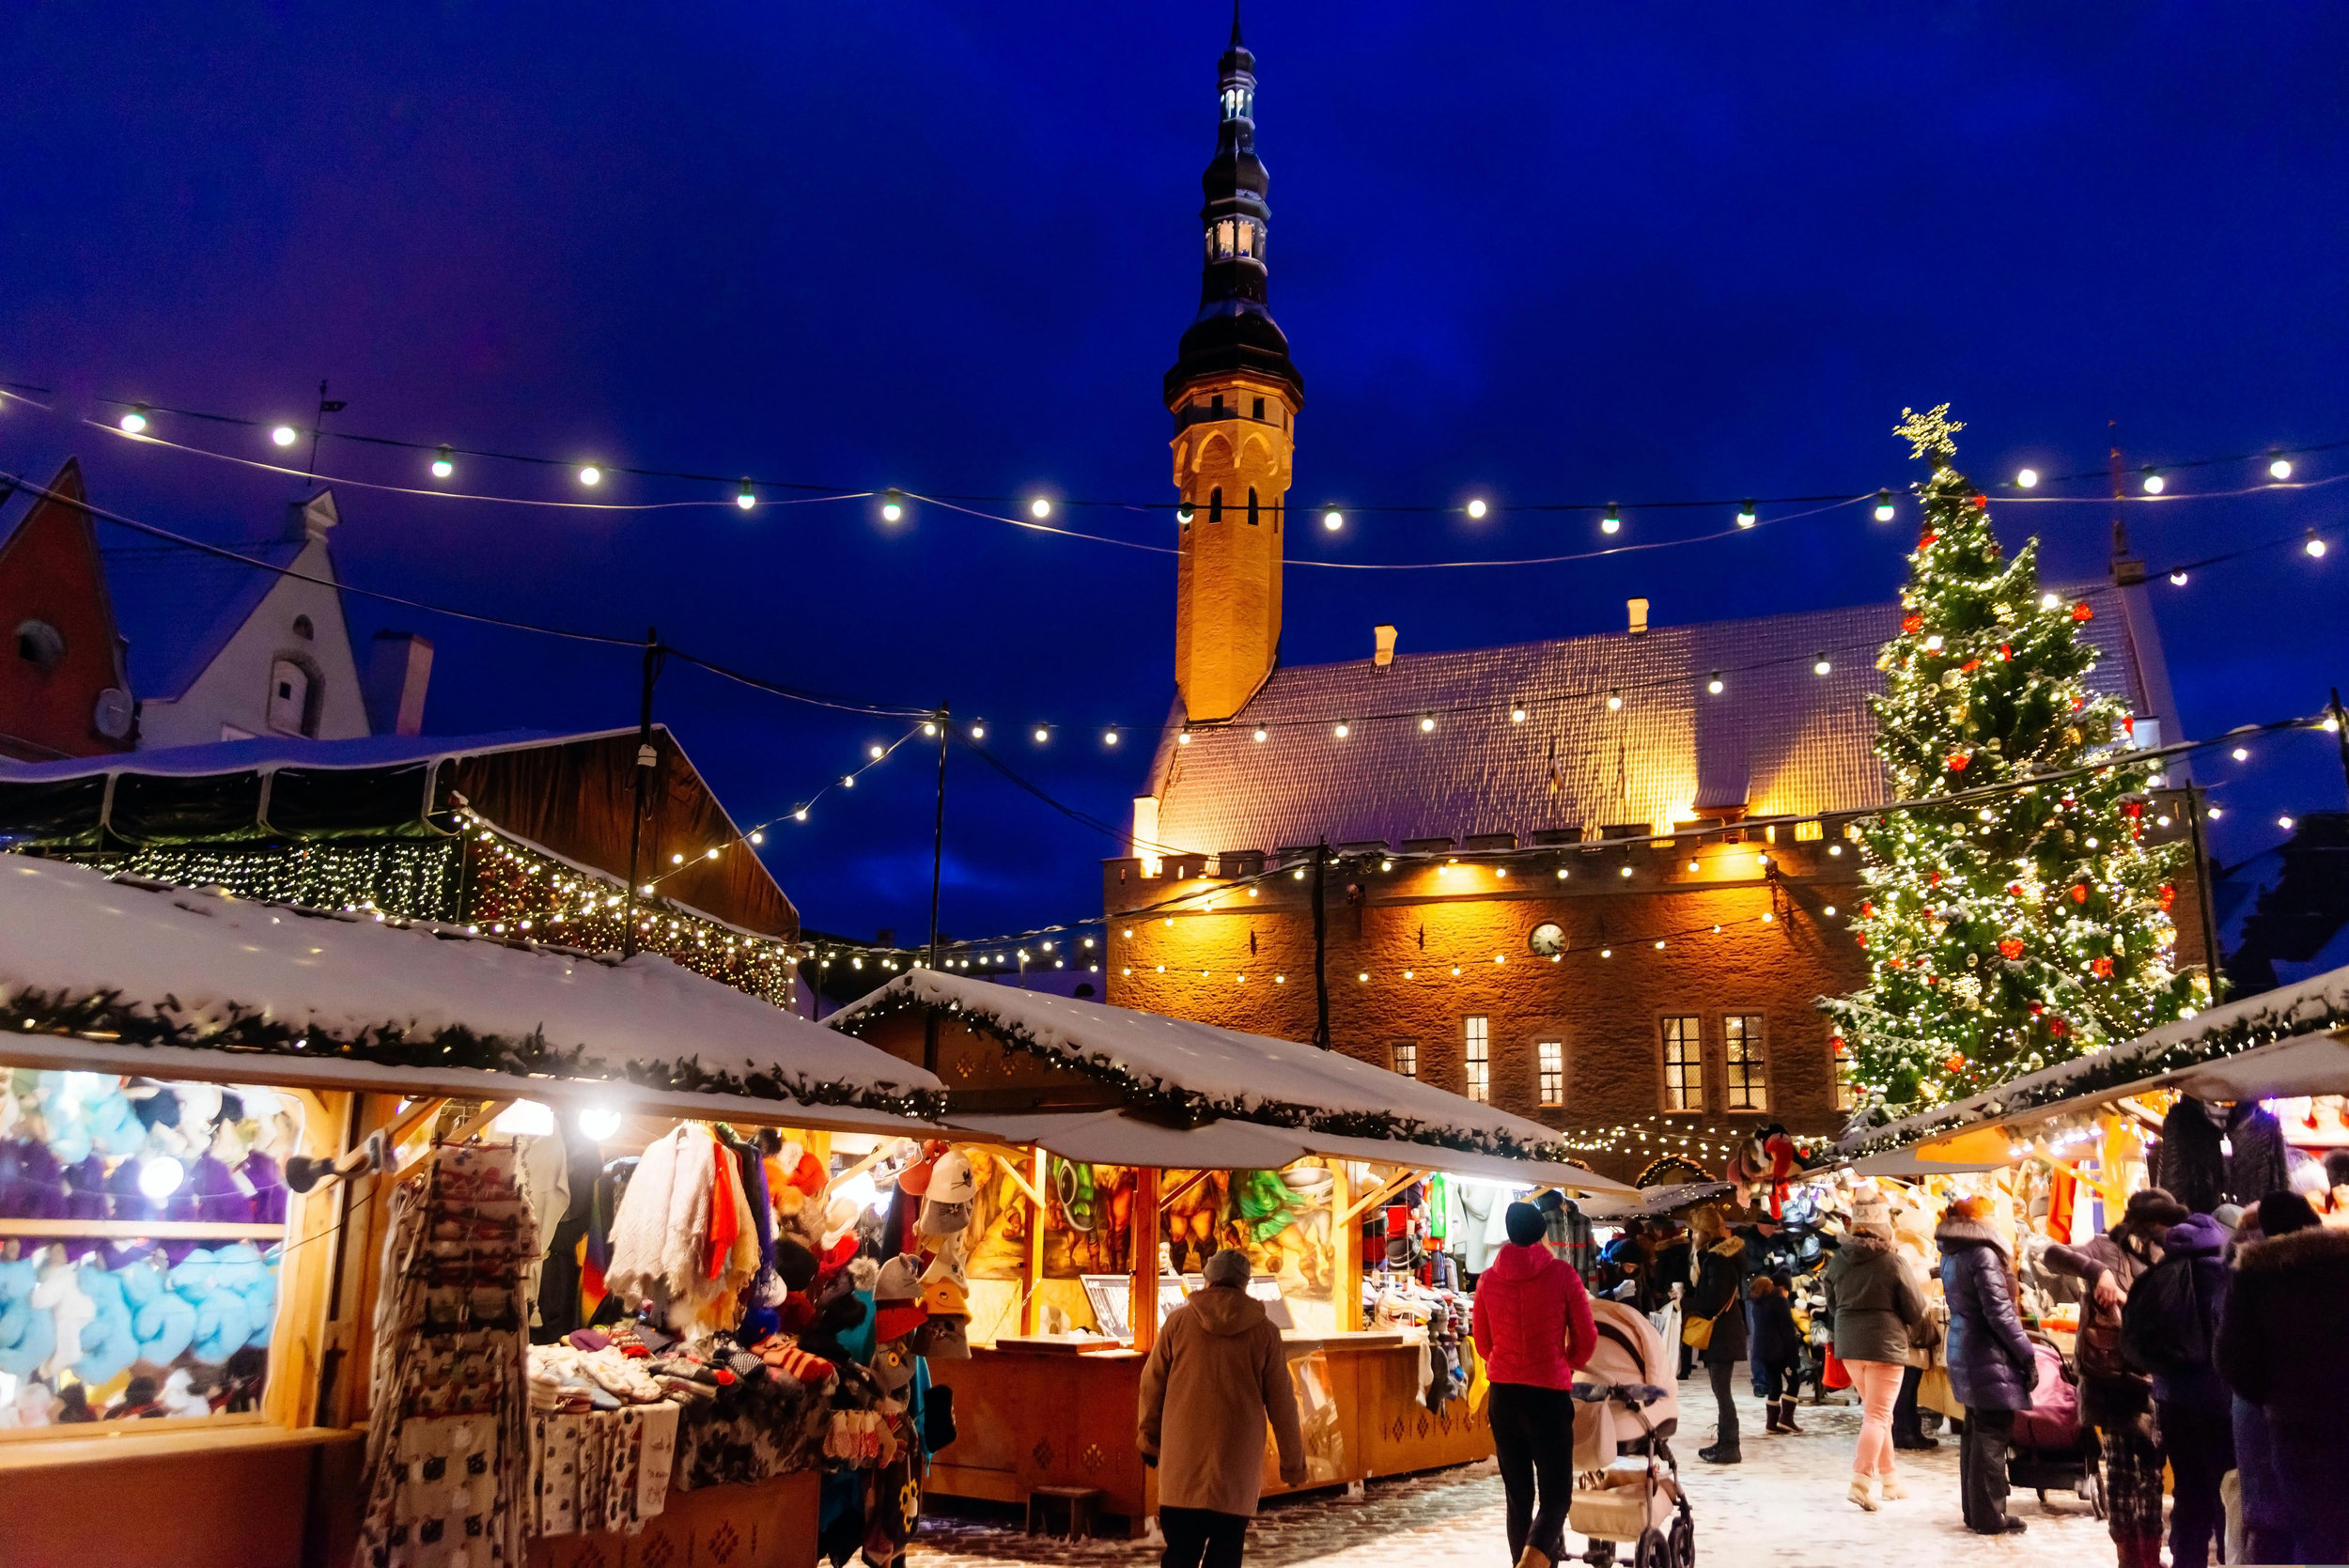 Merry Merry Christmas  - ADVANCED    Roman Stefuryshyn